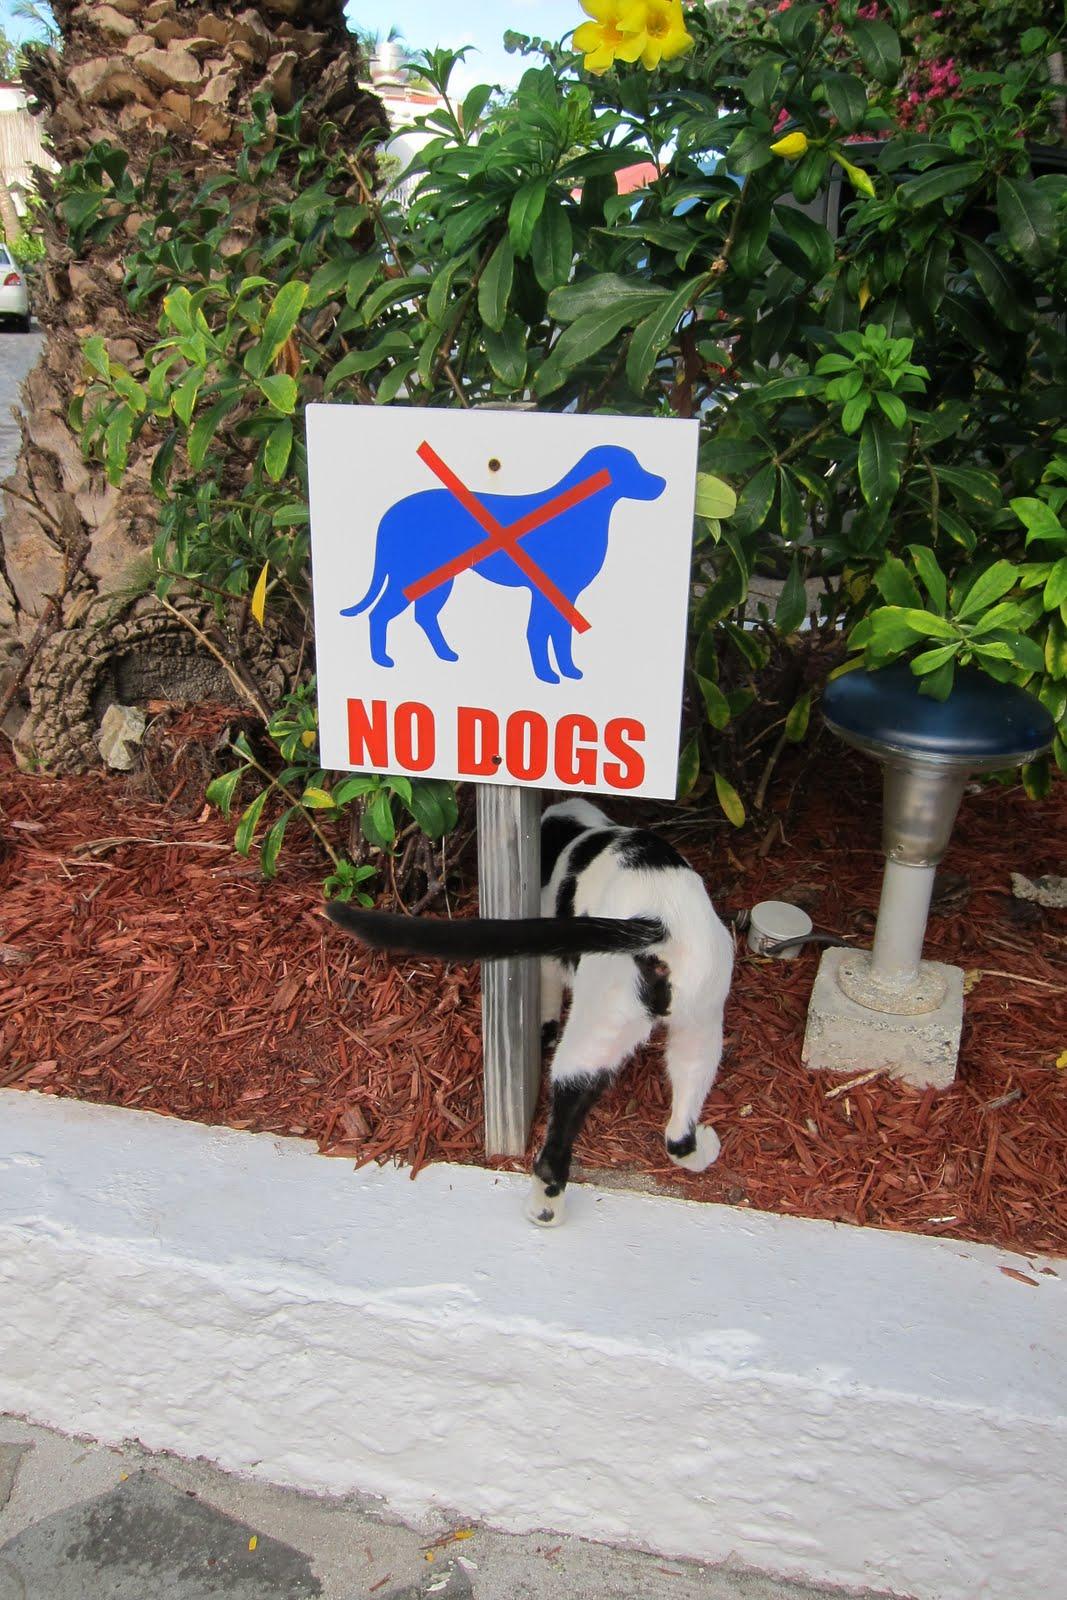 http://4.bp.blogspot.com/-fvZYK3M1_c8/TXIw0-DQIvI/AAAAAAAABu0/KE8rBtb94GQ/s1600/075_No_Dogs_Just_Cats.JPG